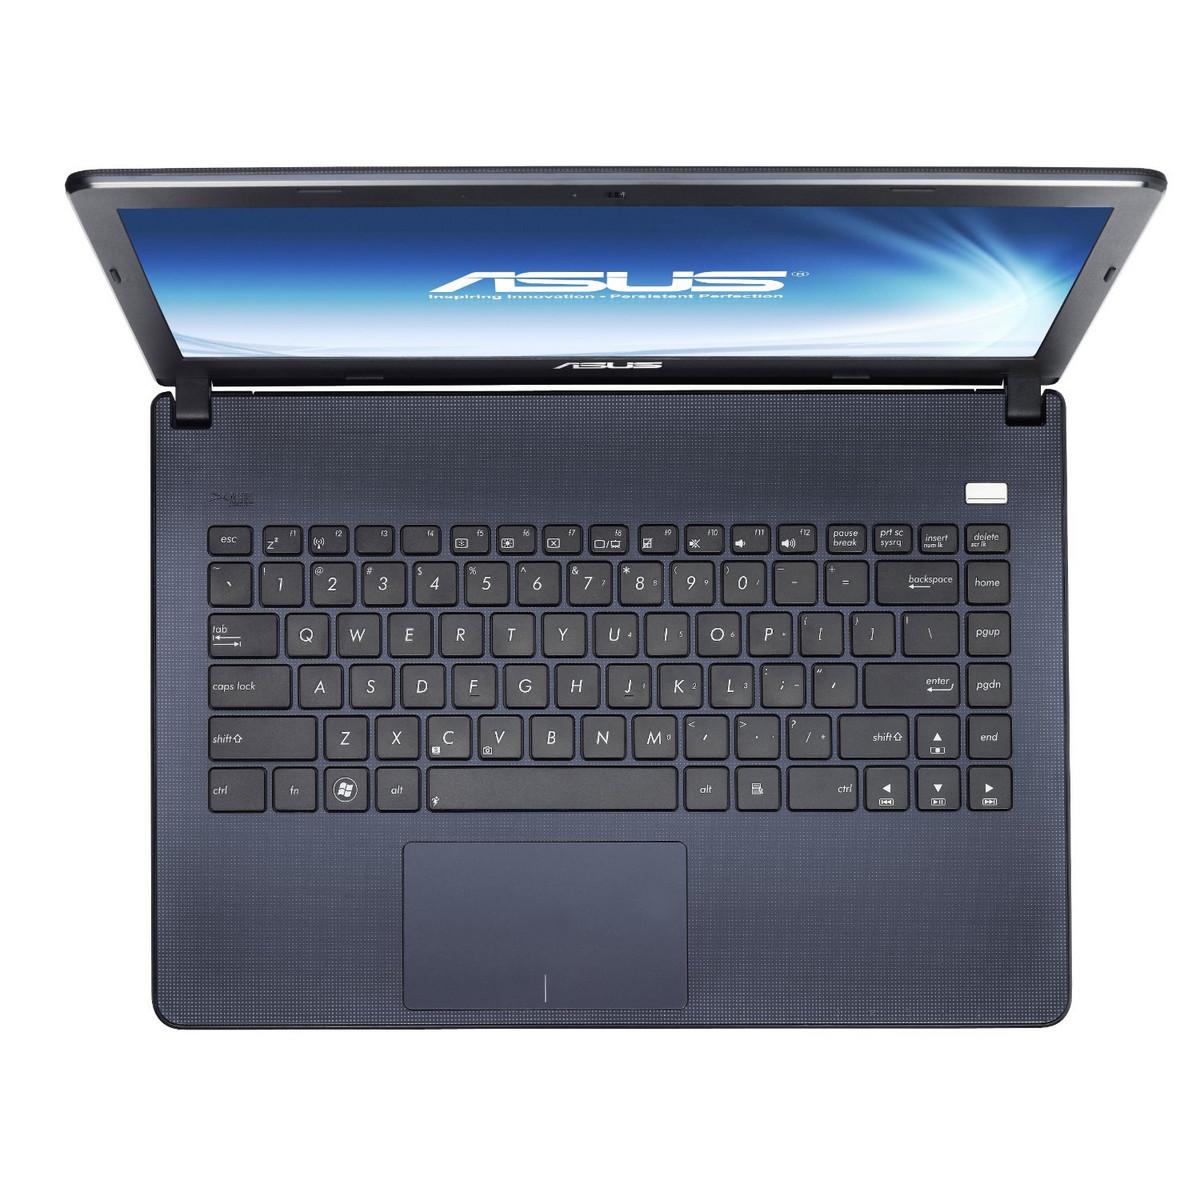 Asus X401a Wx115v Notebookcheck Com Externe Tests